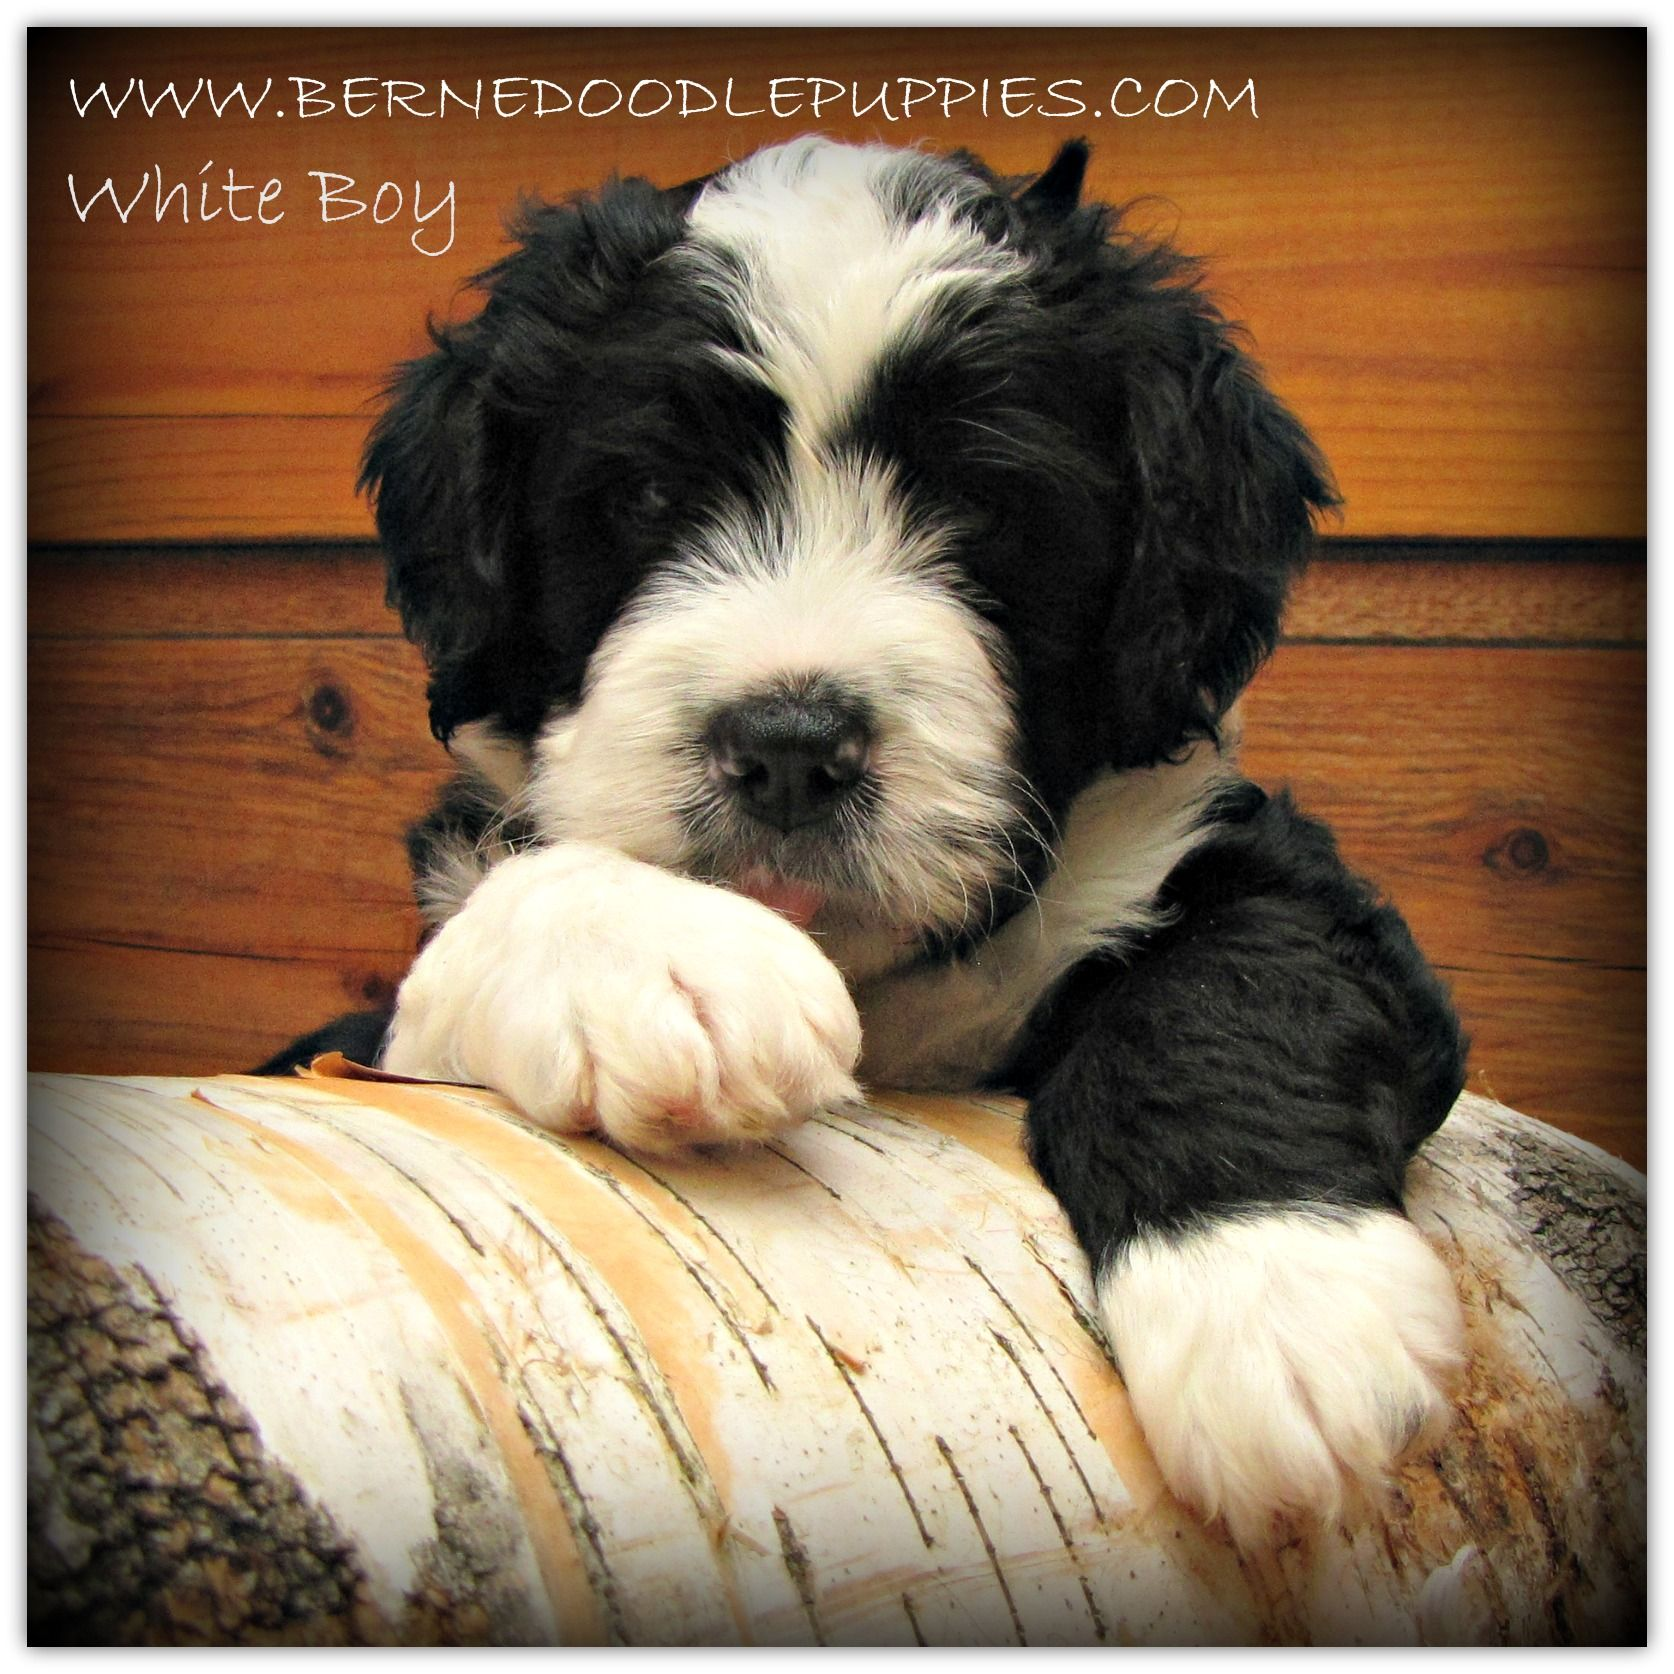 White labrador puppies for sale ontario